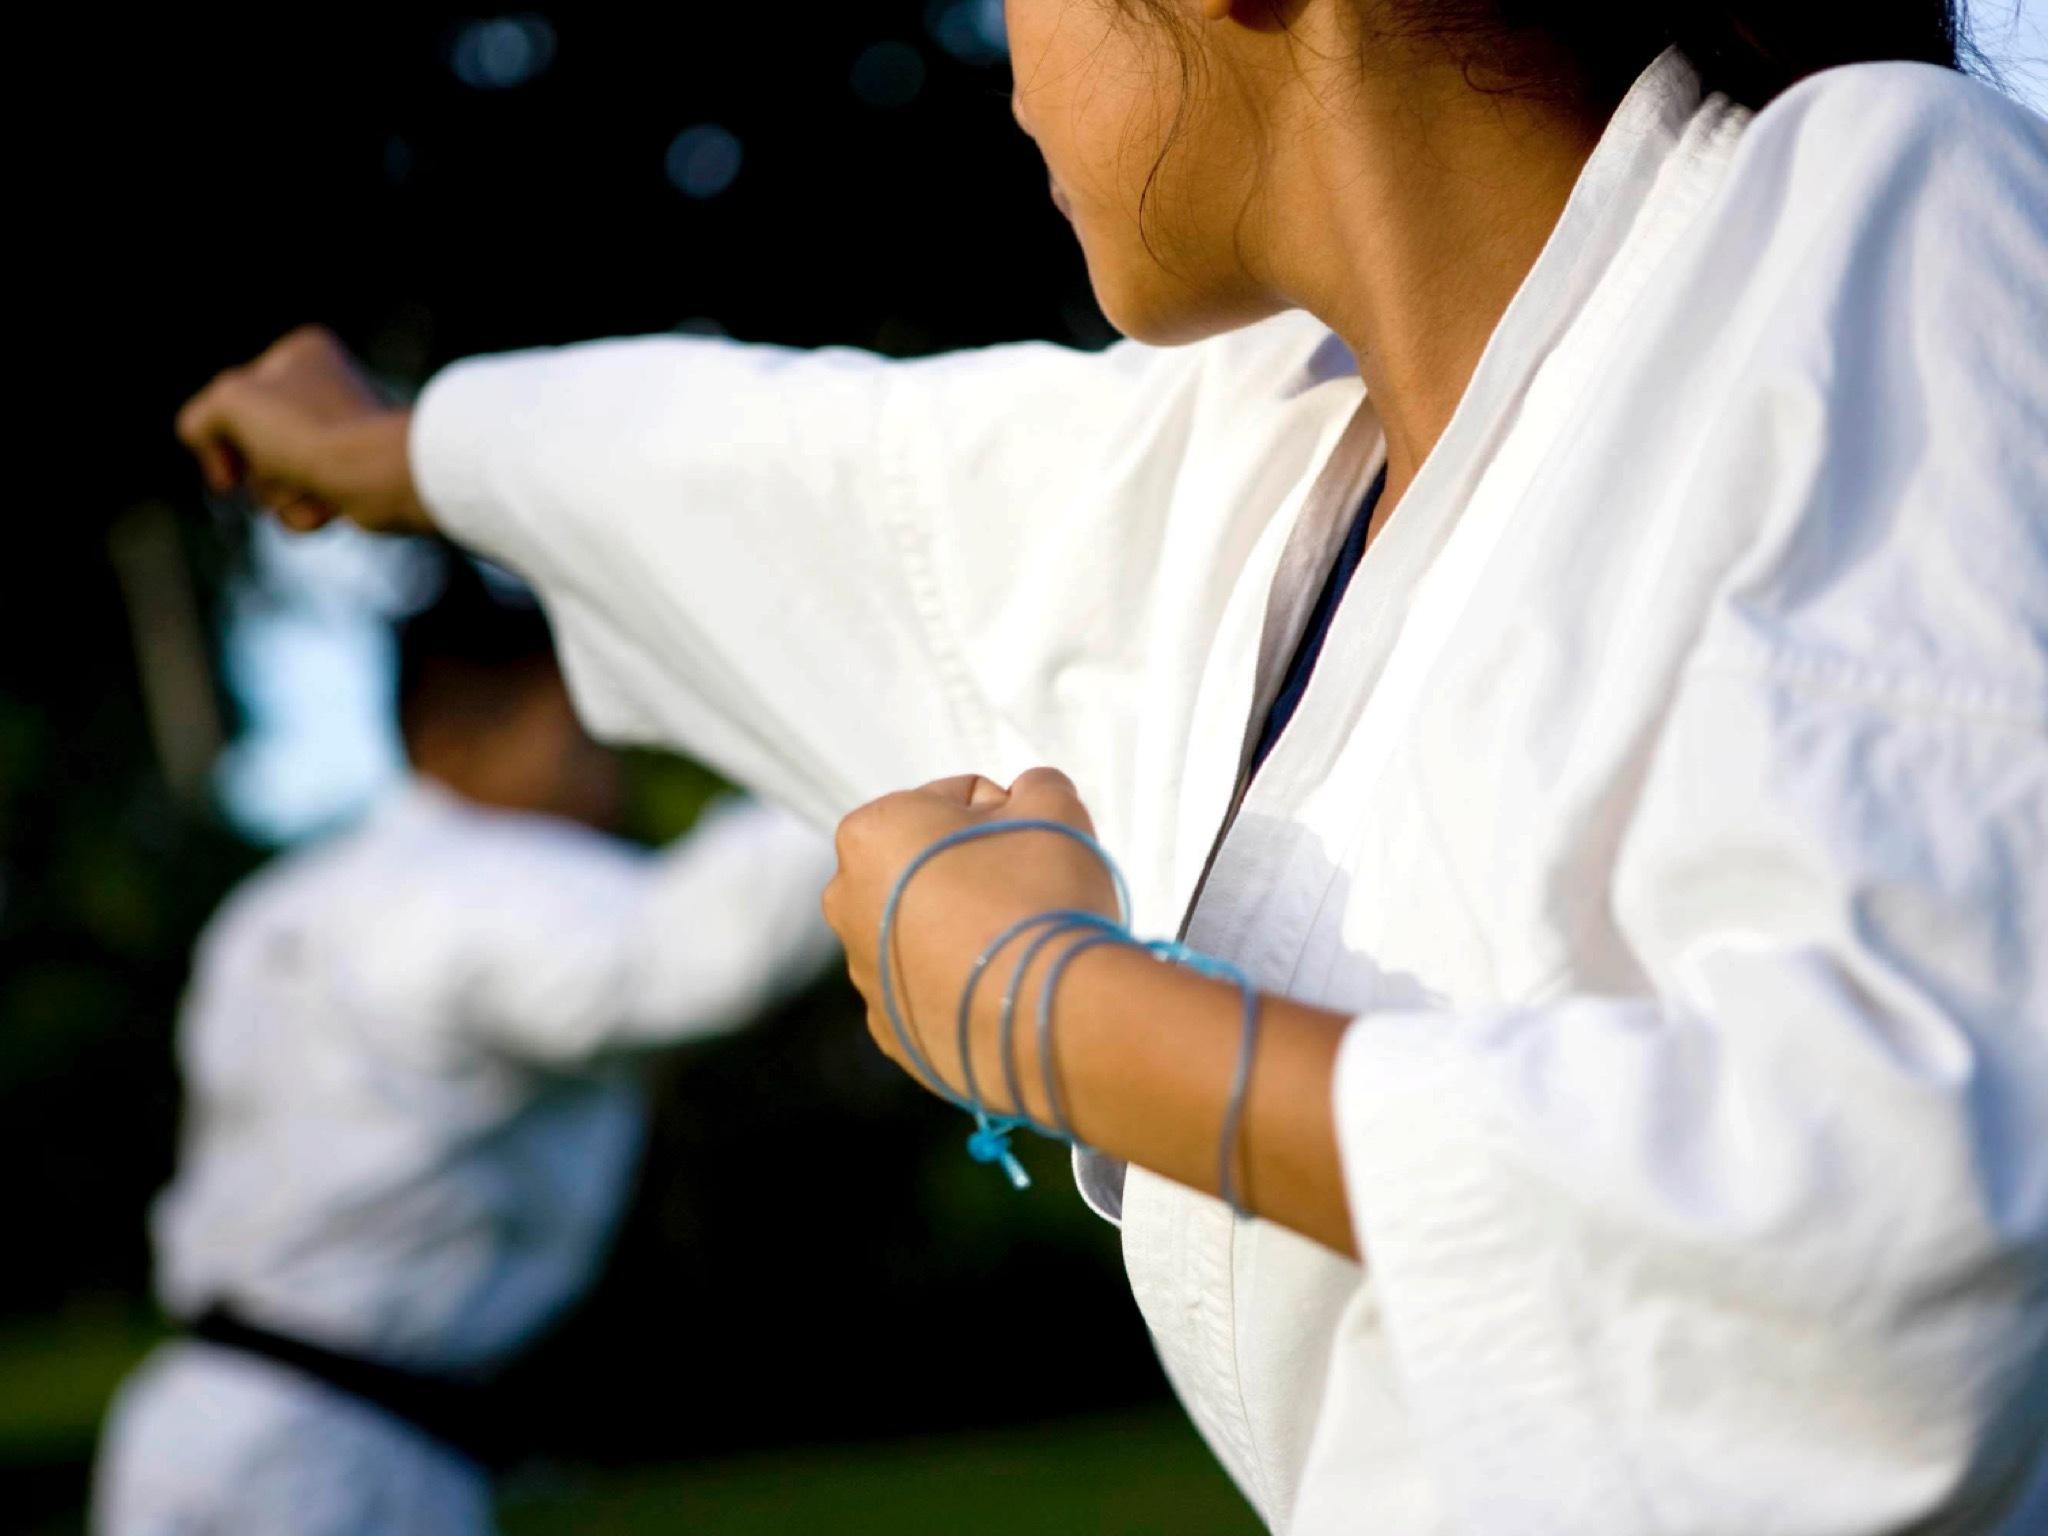 A close up shot of a woman practicing martial arts